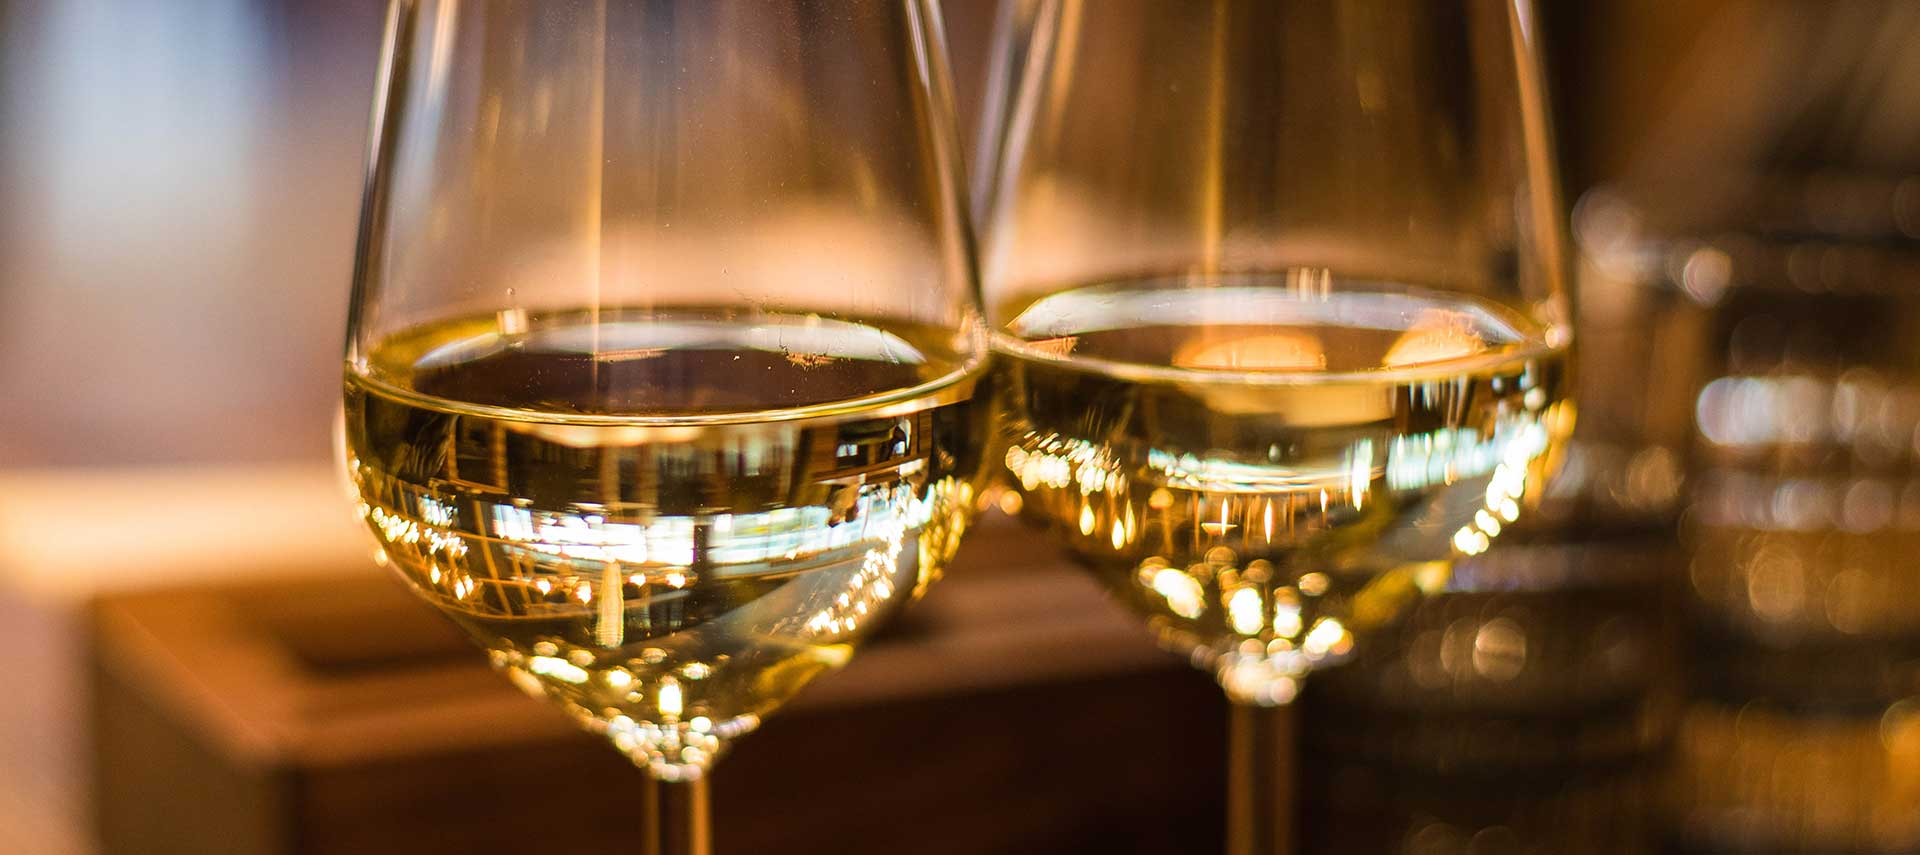 Champagne-quality